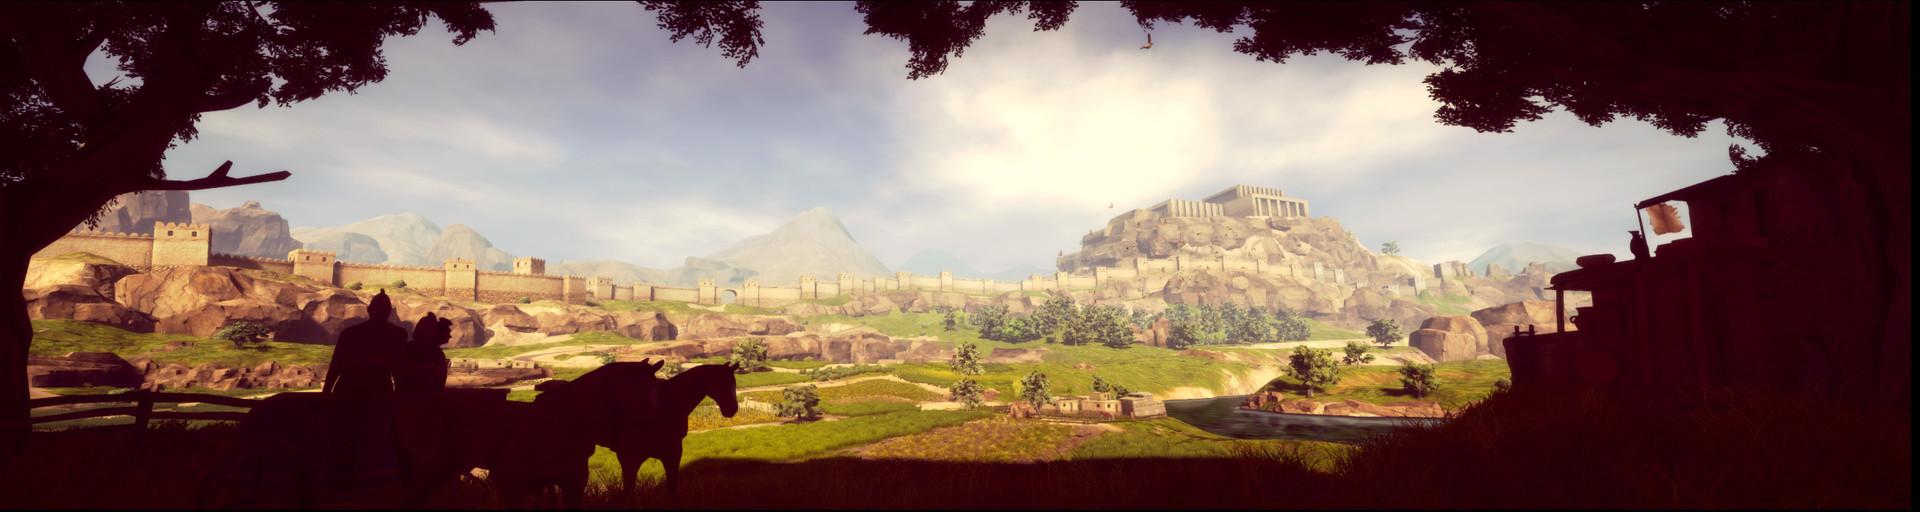 Hittite Village, screenshot from midday